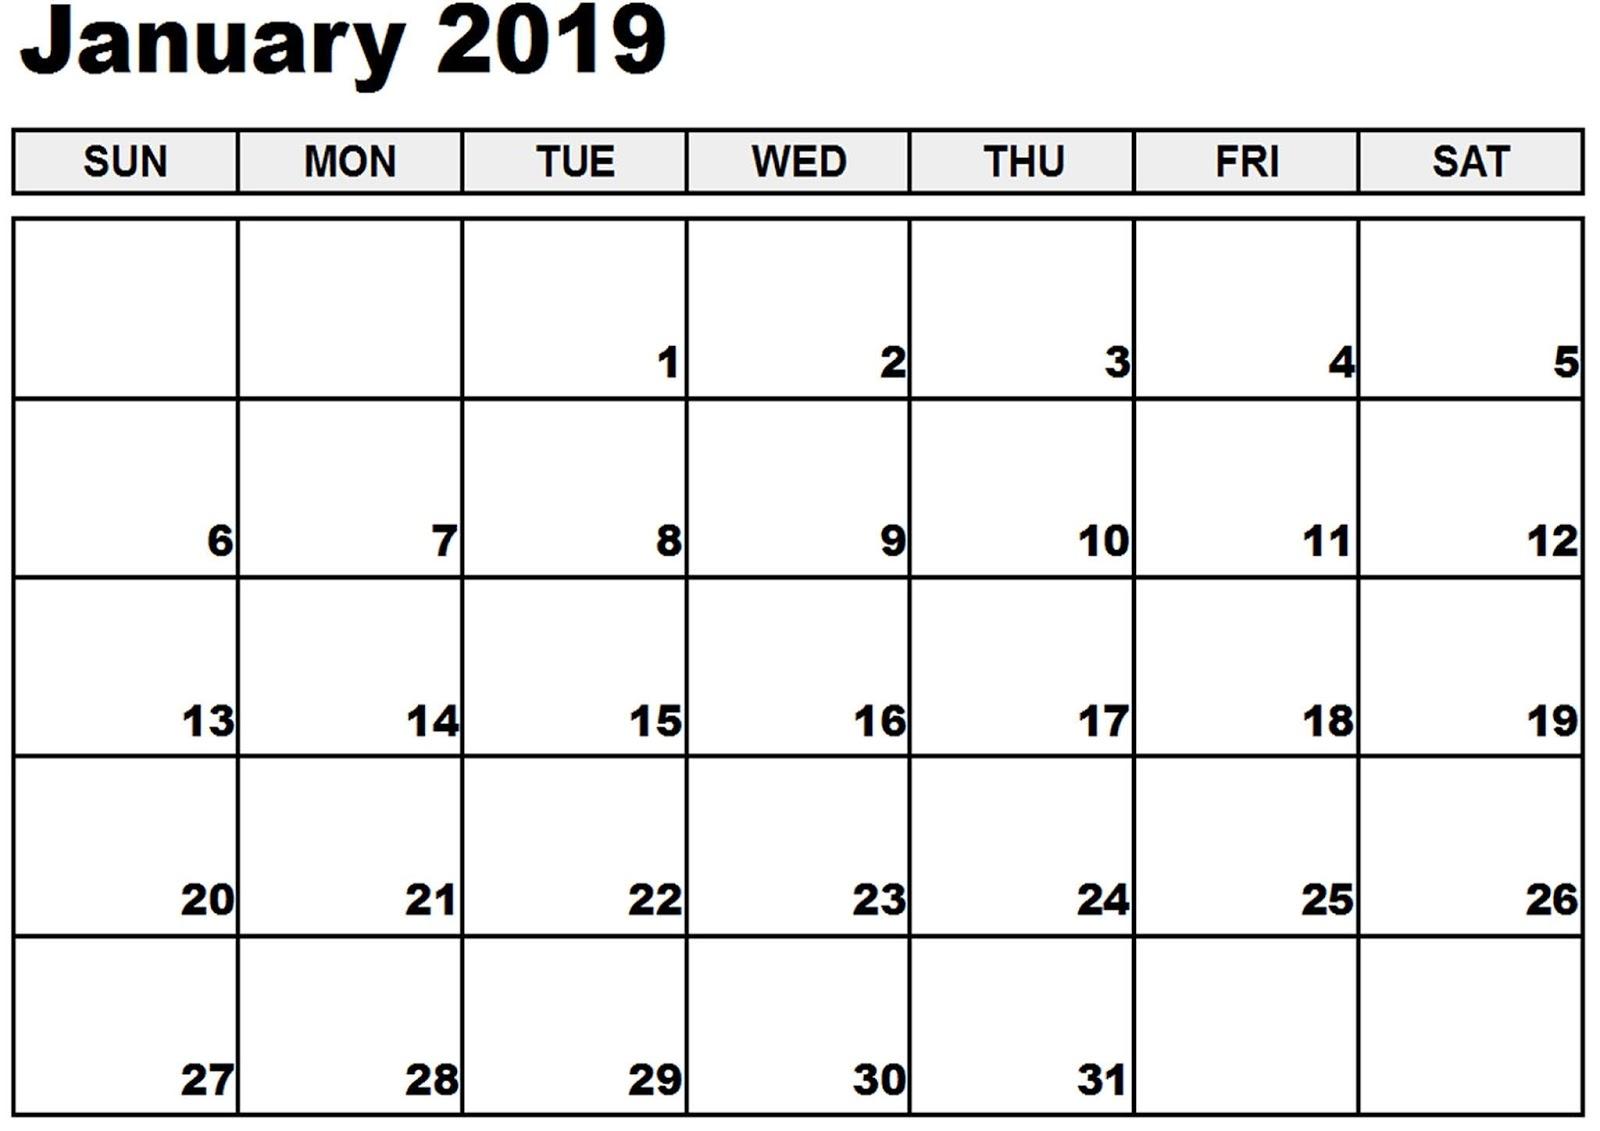 january 2019 calendar a4 download free